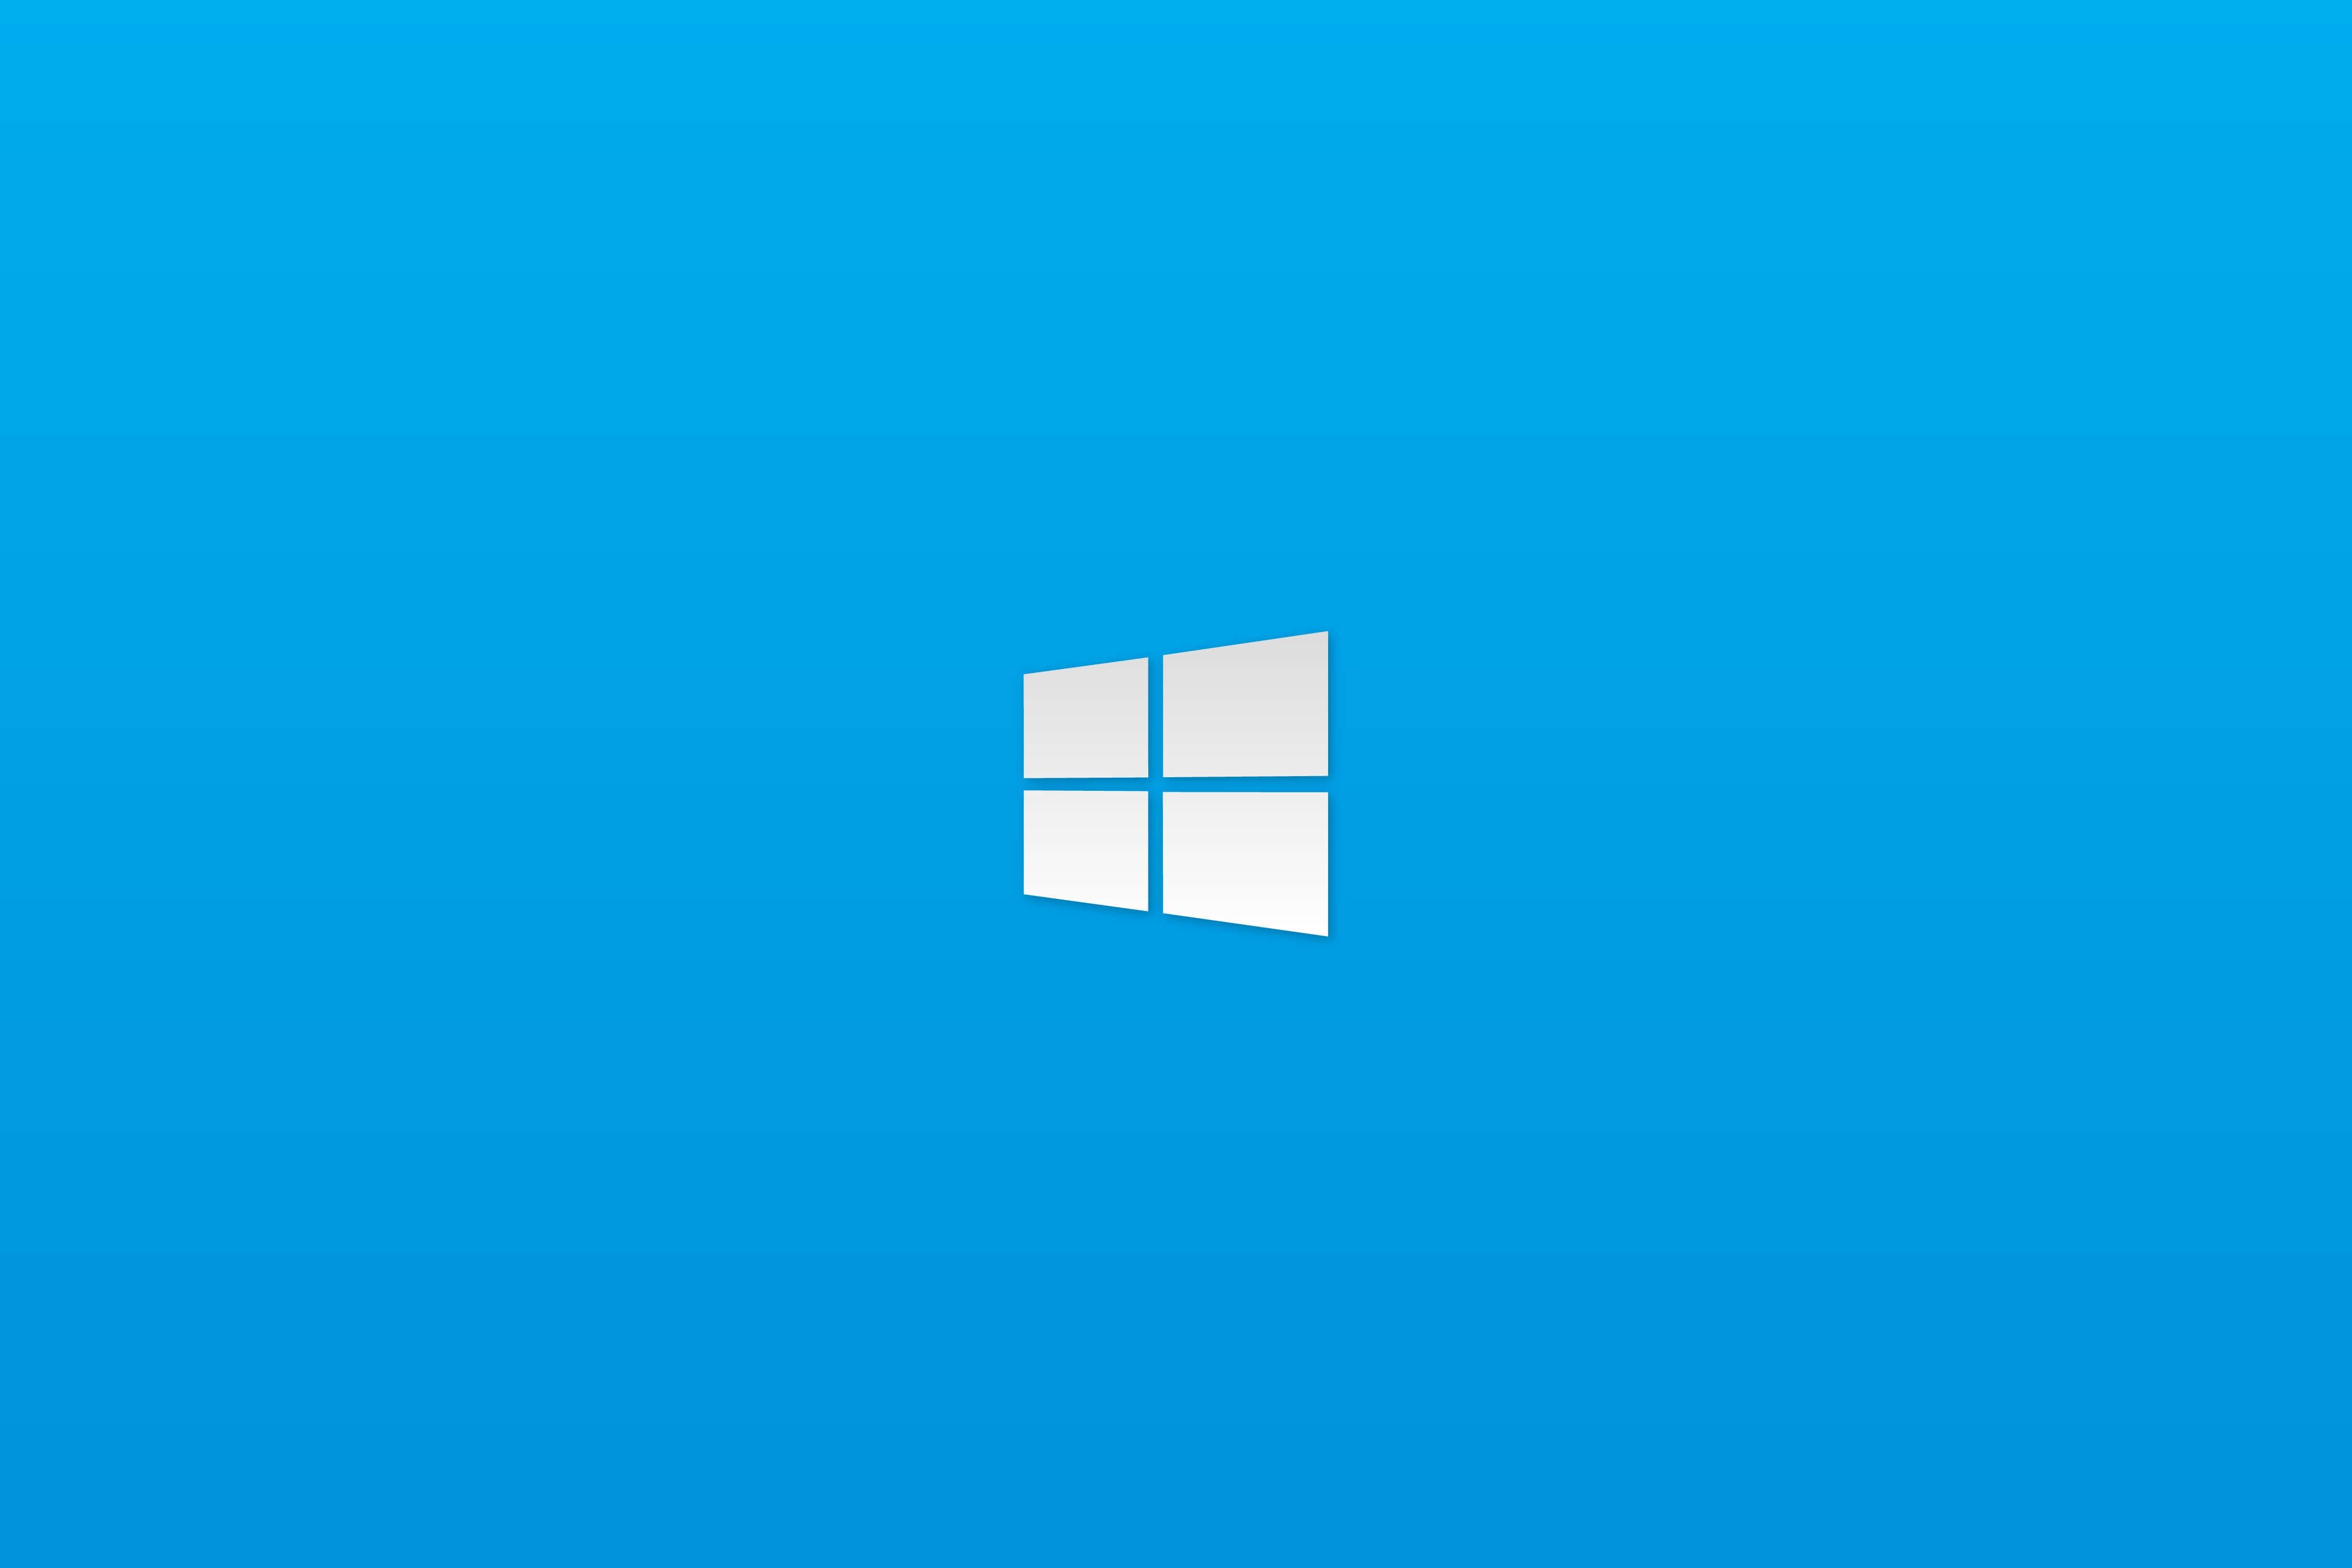 Simple Windows 10 computer wallpaper